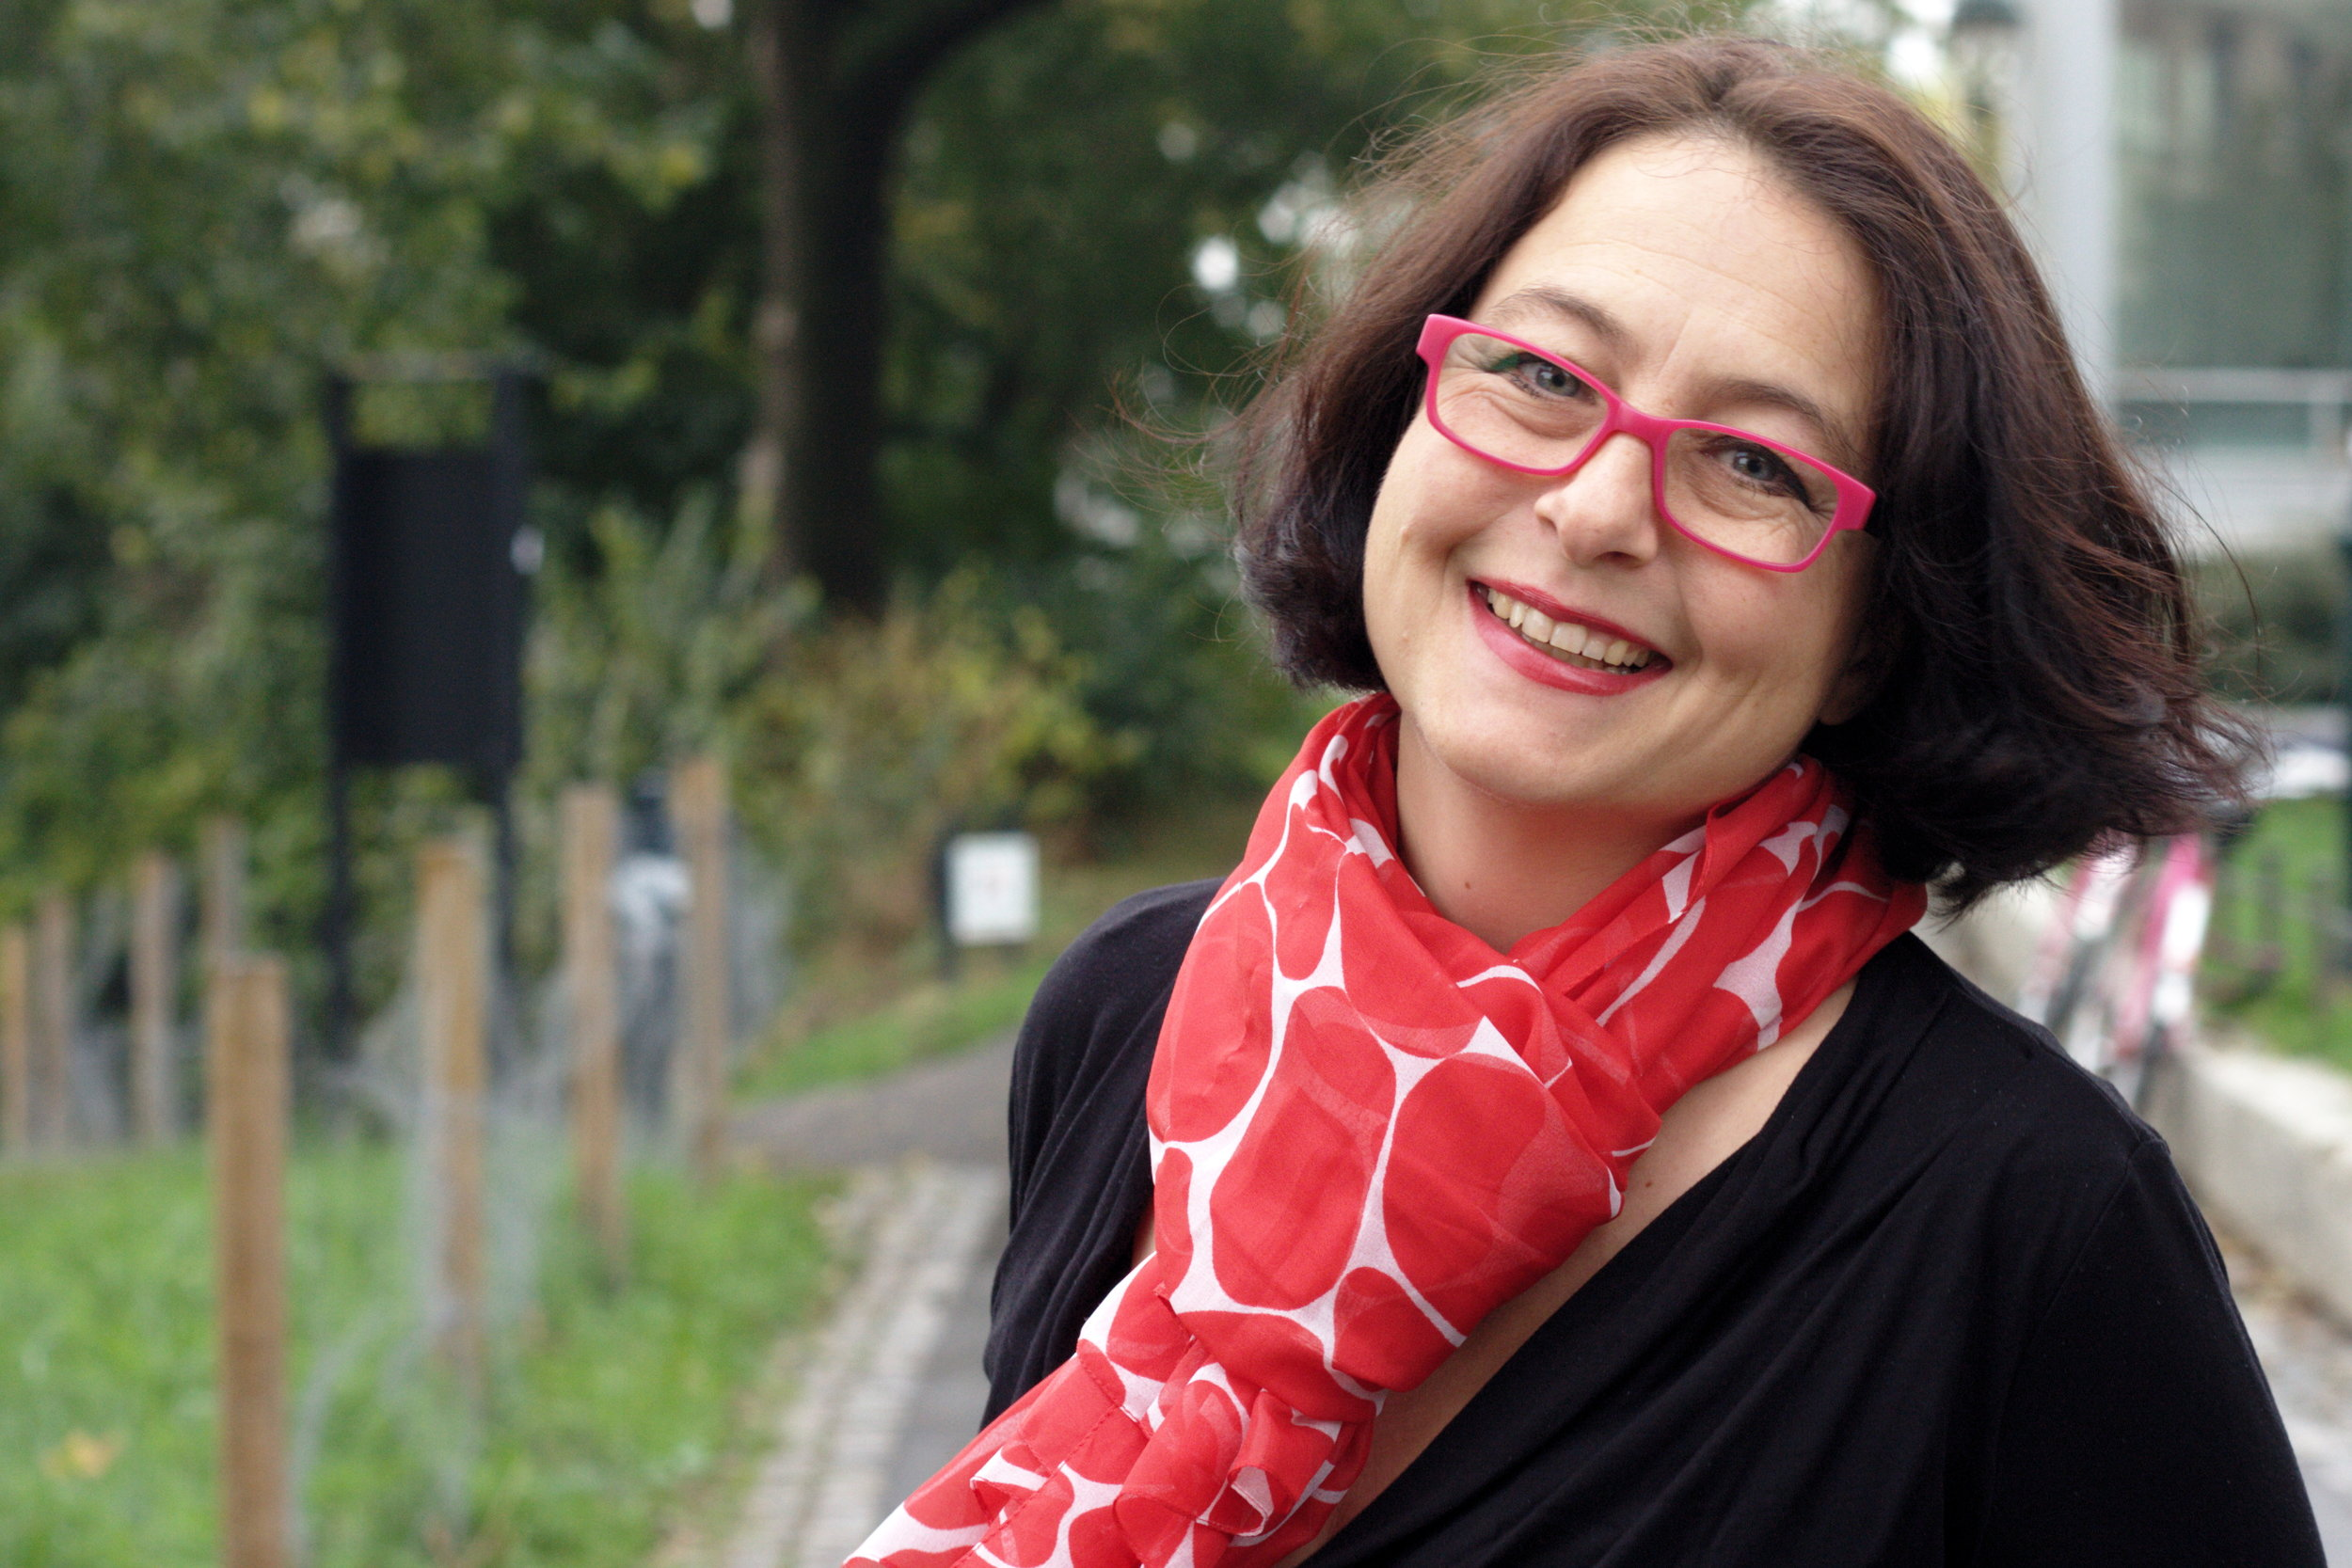 Gabriela Kaprálová, photo (c) Monika Grilli Wagnerova